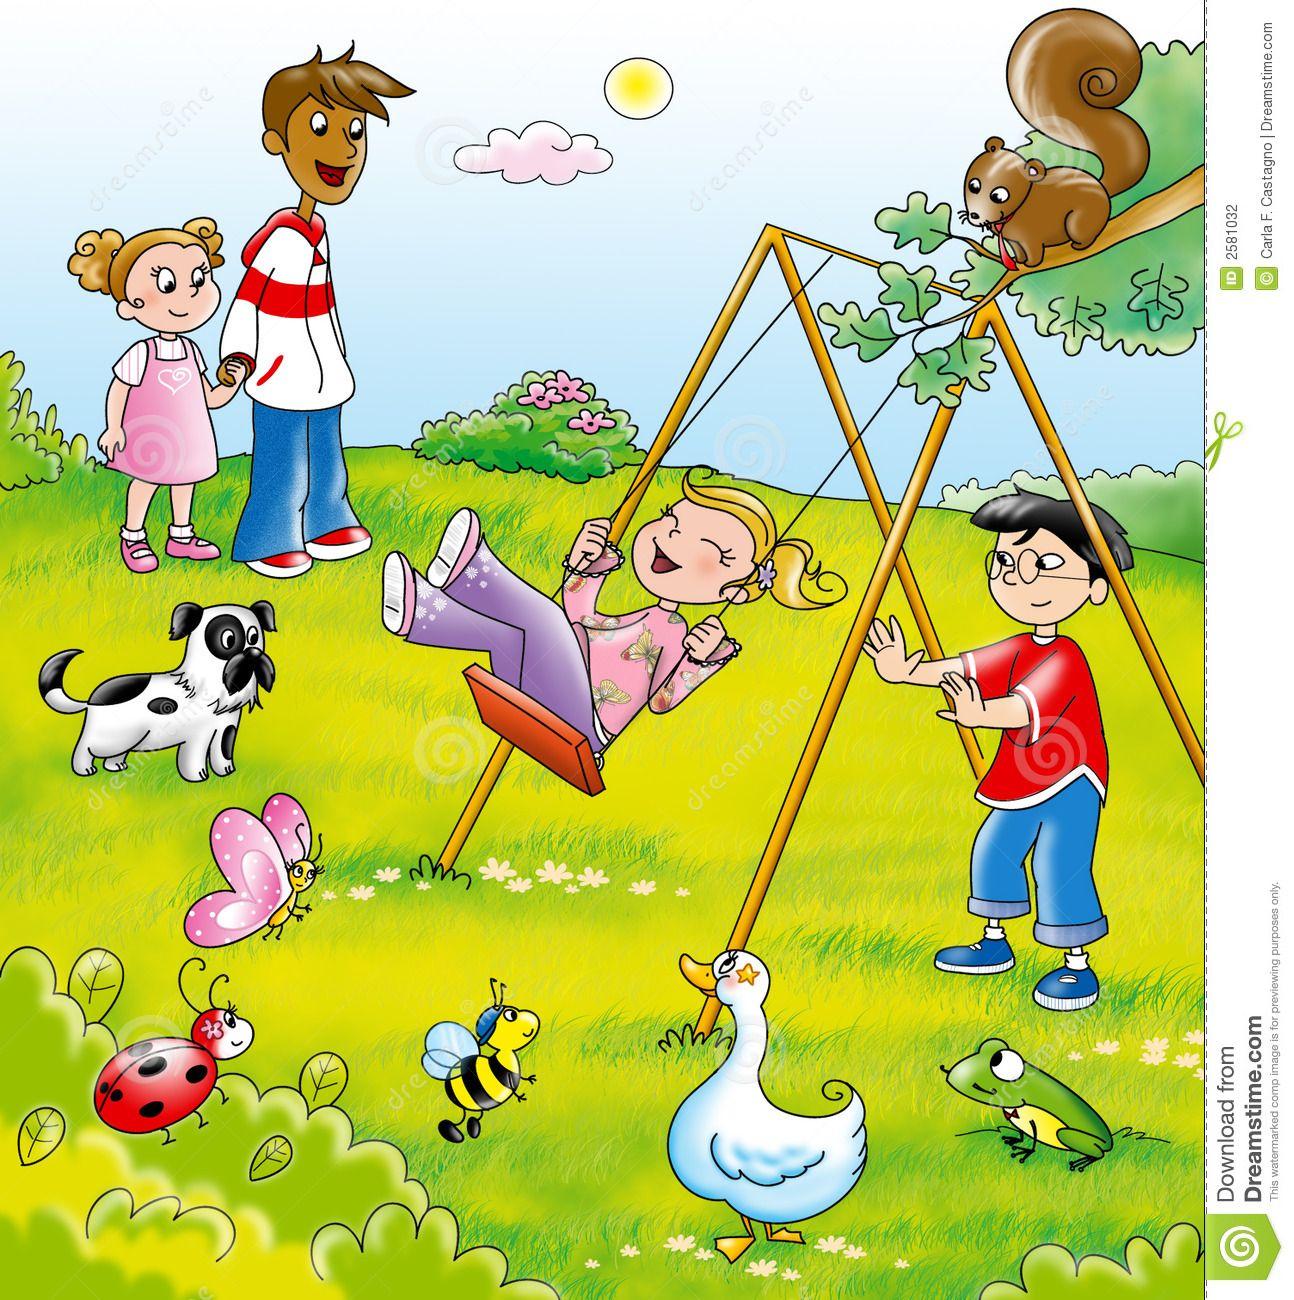 Kids in a park | Girl Scouts Ideas | Pinterest | Cartoon ...